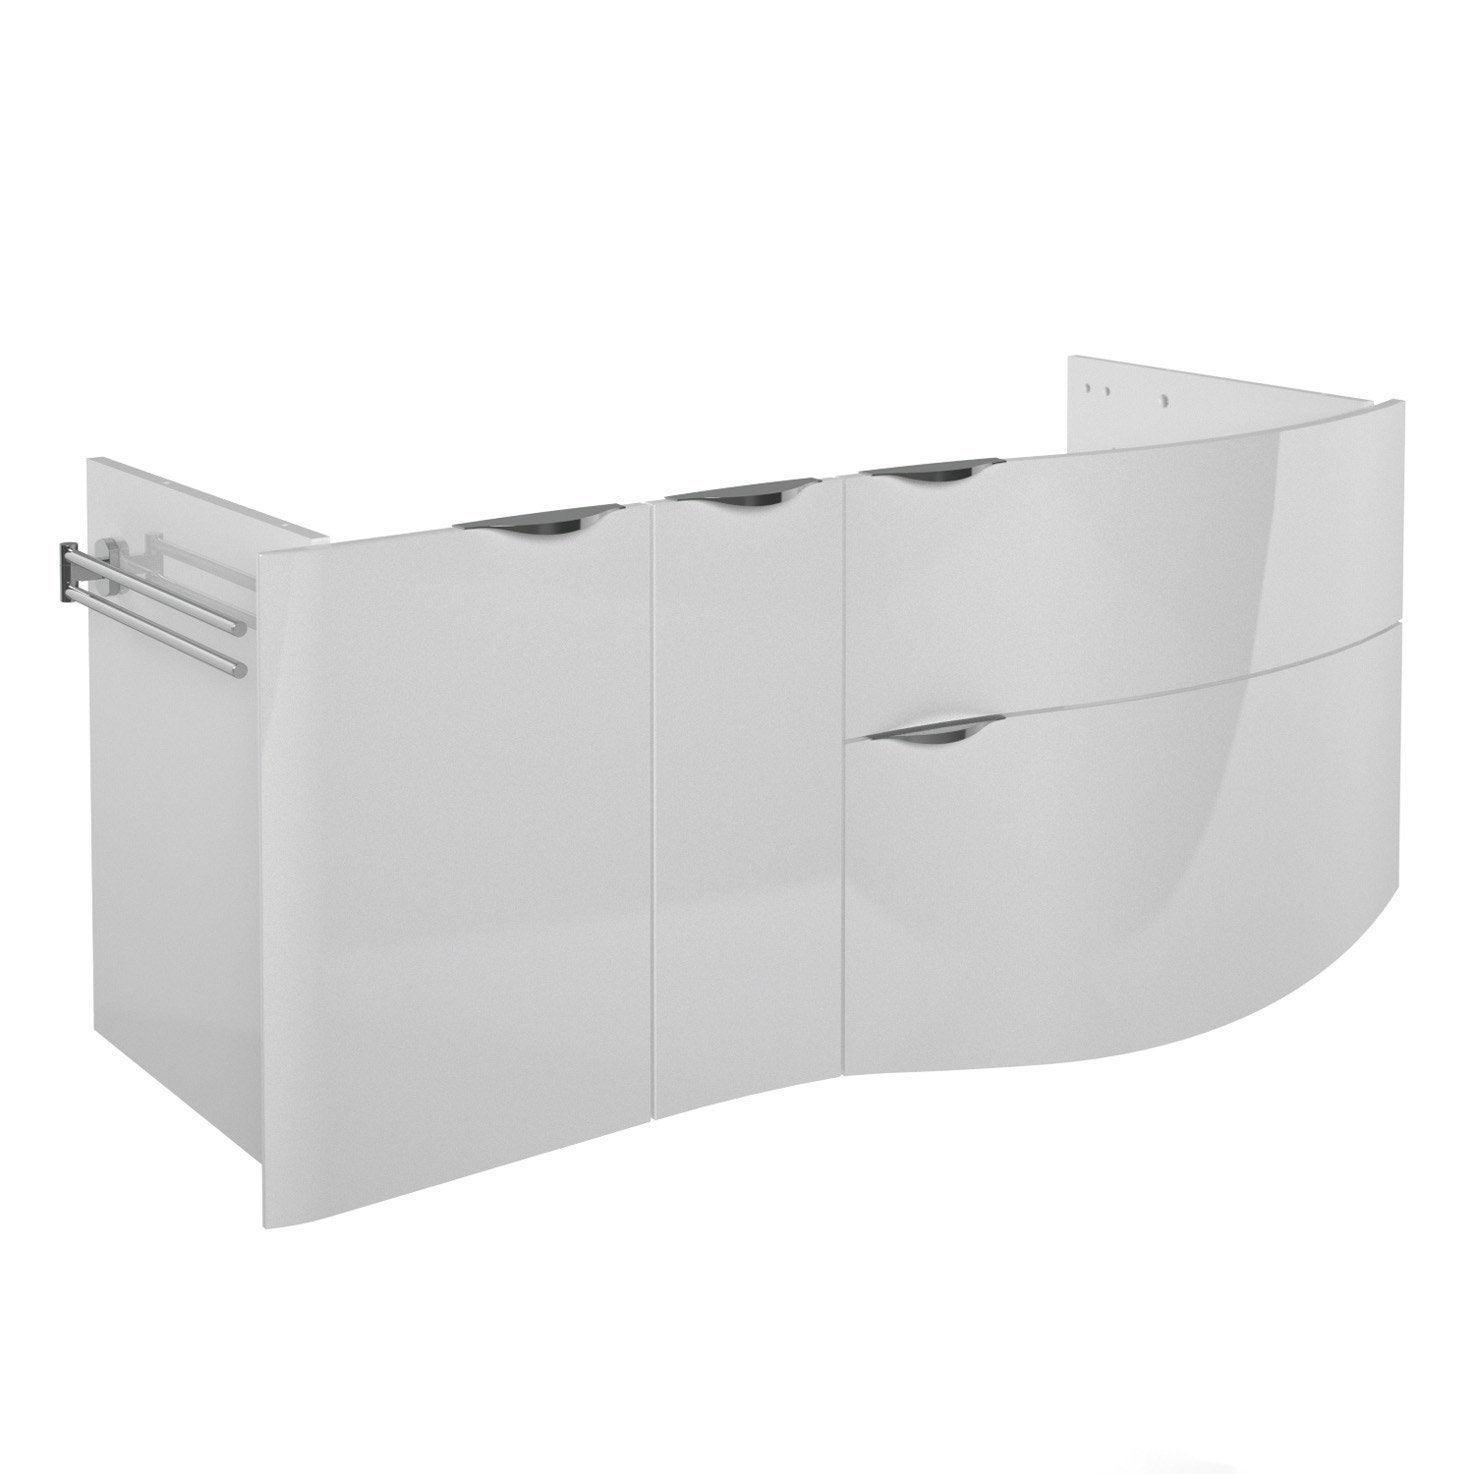 Meuble salle de bain 130 cm prix bas avec brico depot et for Meuble salle de bain prix